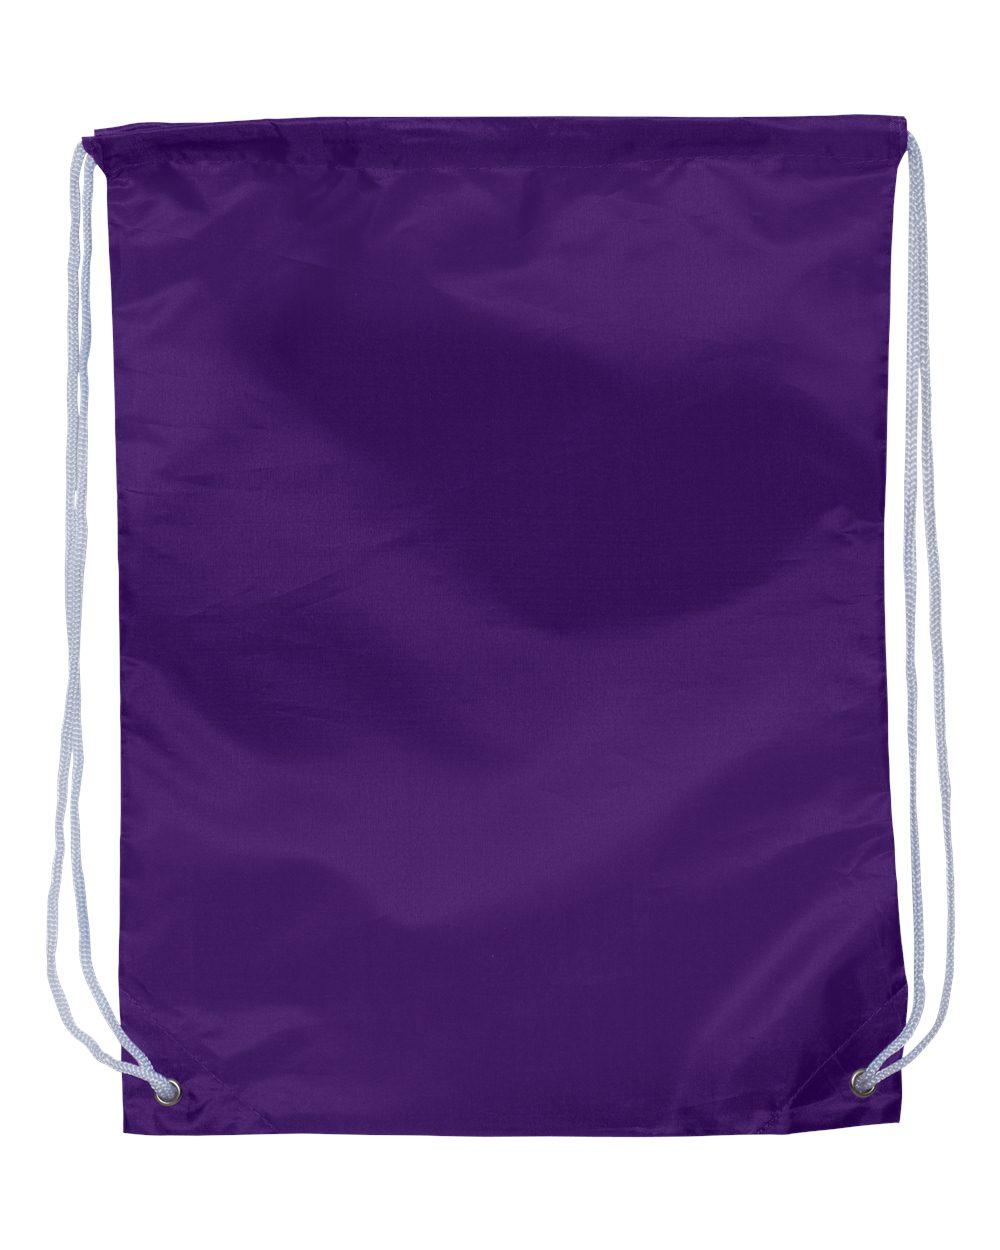 Valubag VB0058 - Nylon Cinch Bag Draw String Backpack